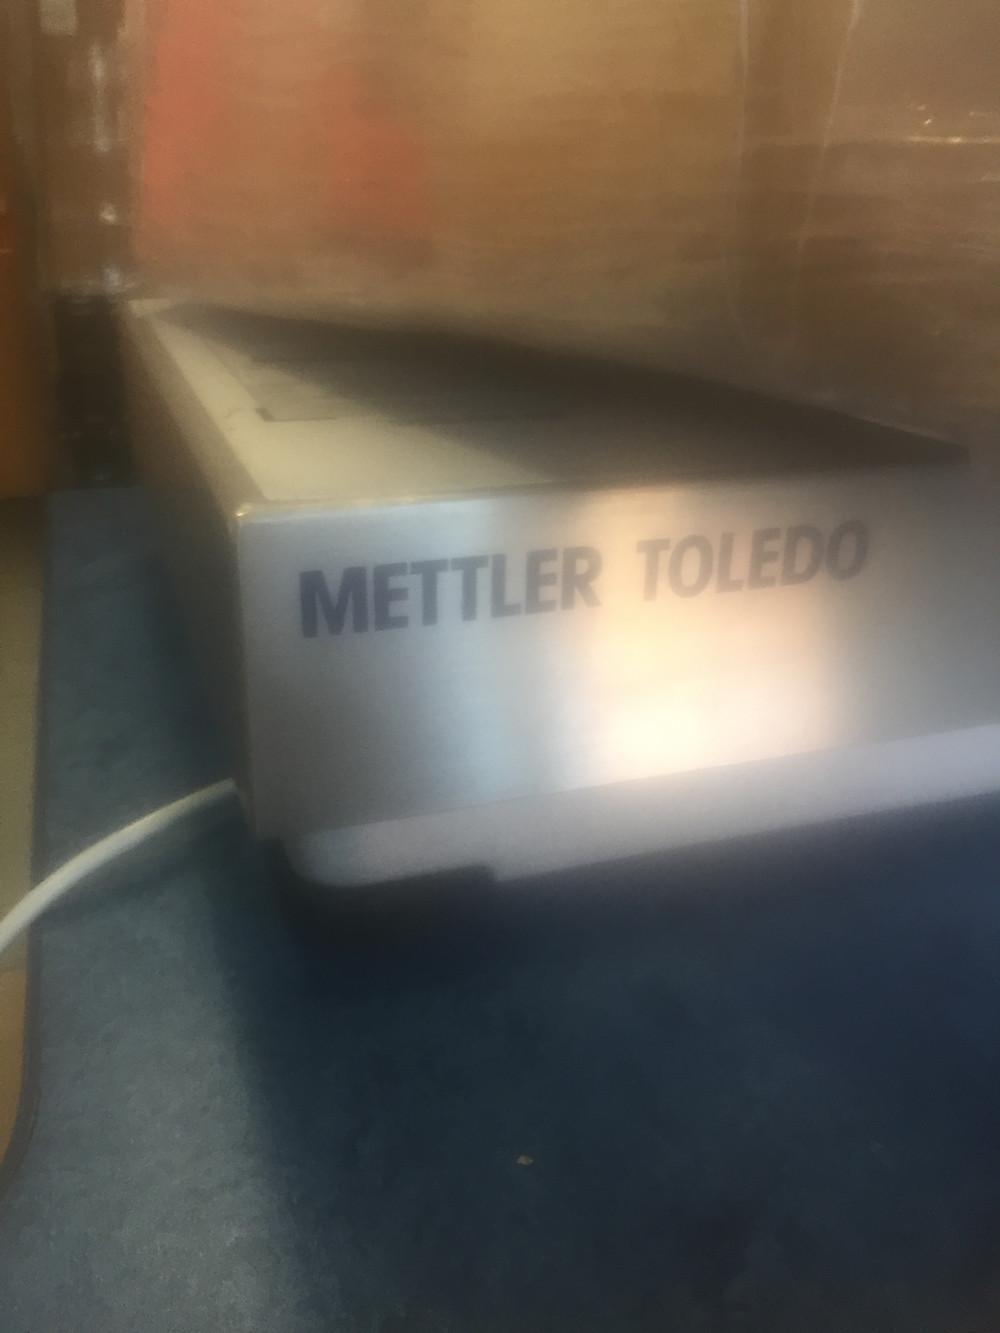 Ohio Toledo Mettler steel